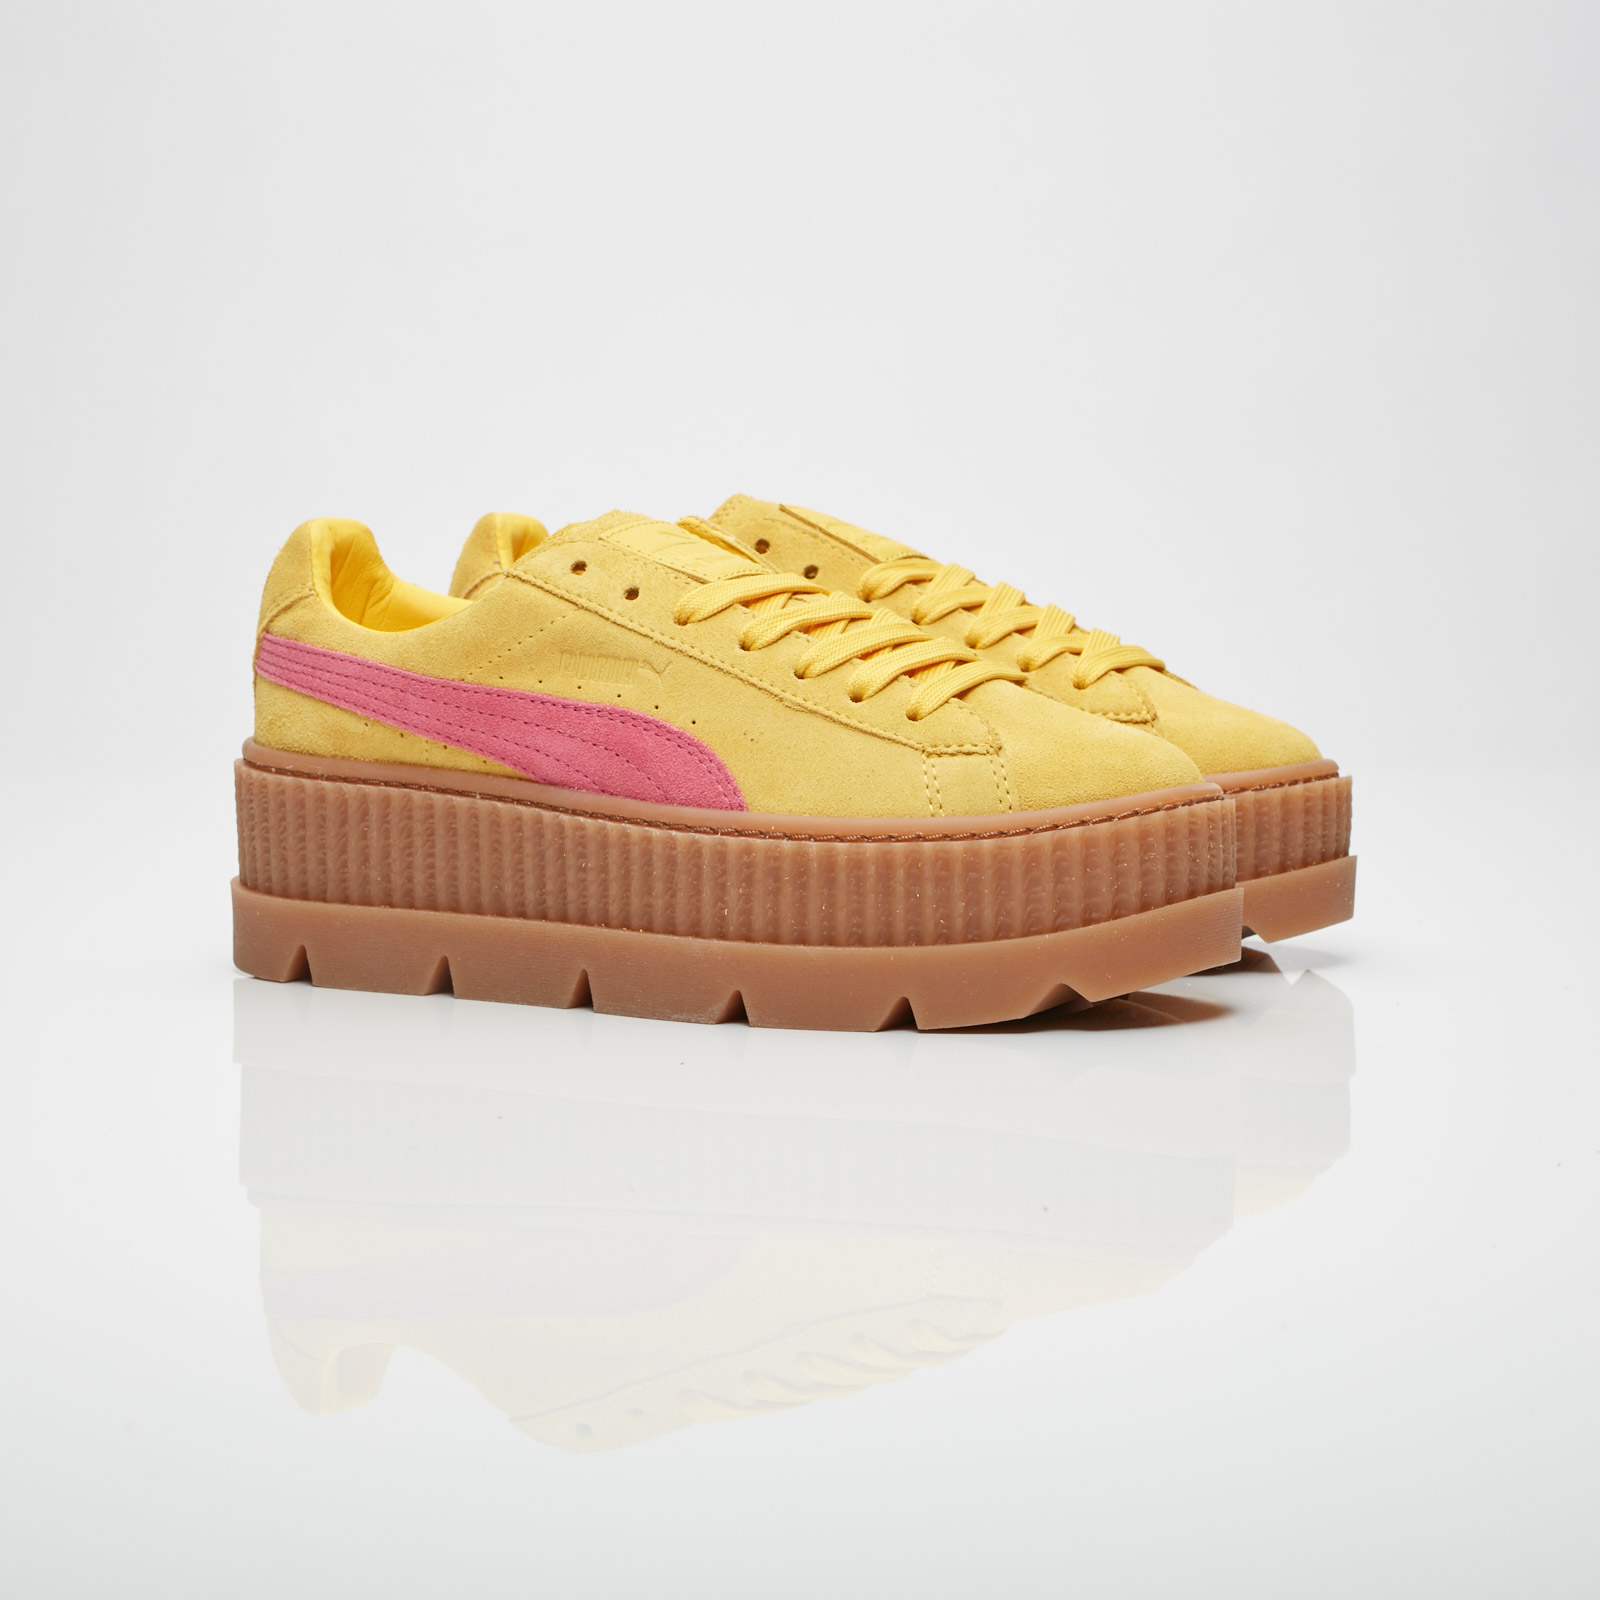 best sneakers 80877 7baa9 Puma Cleated Creeper Suede Wns - 366268-03 - Sneakersnstuff ...